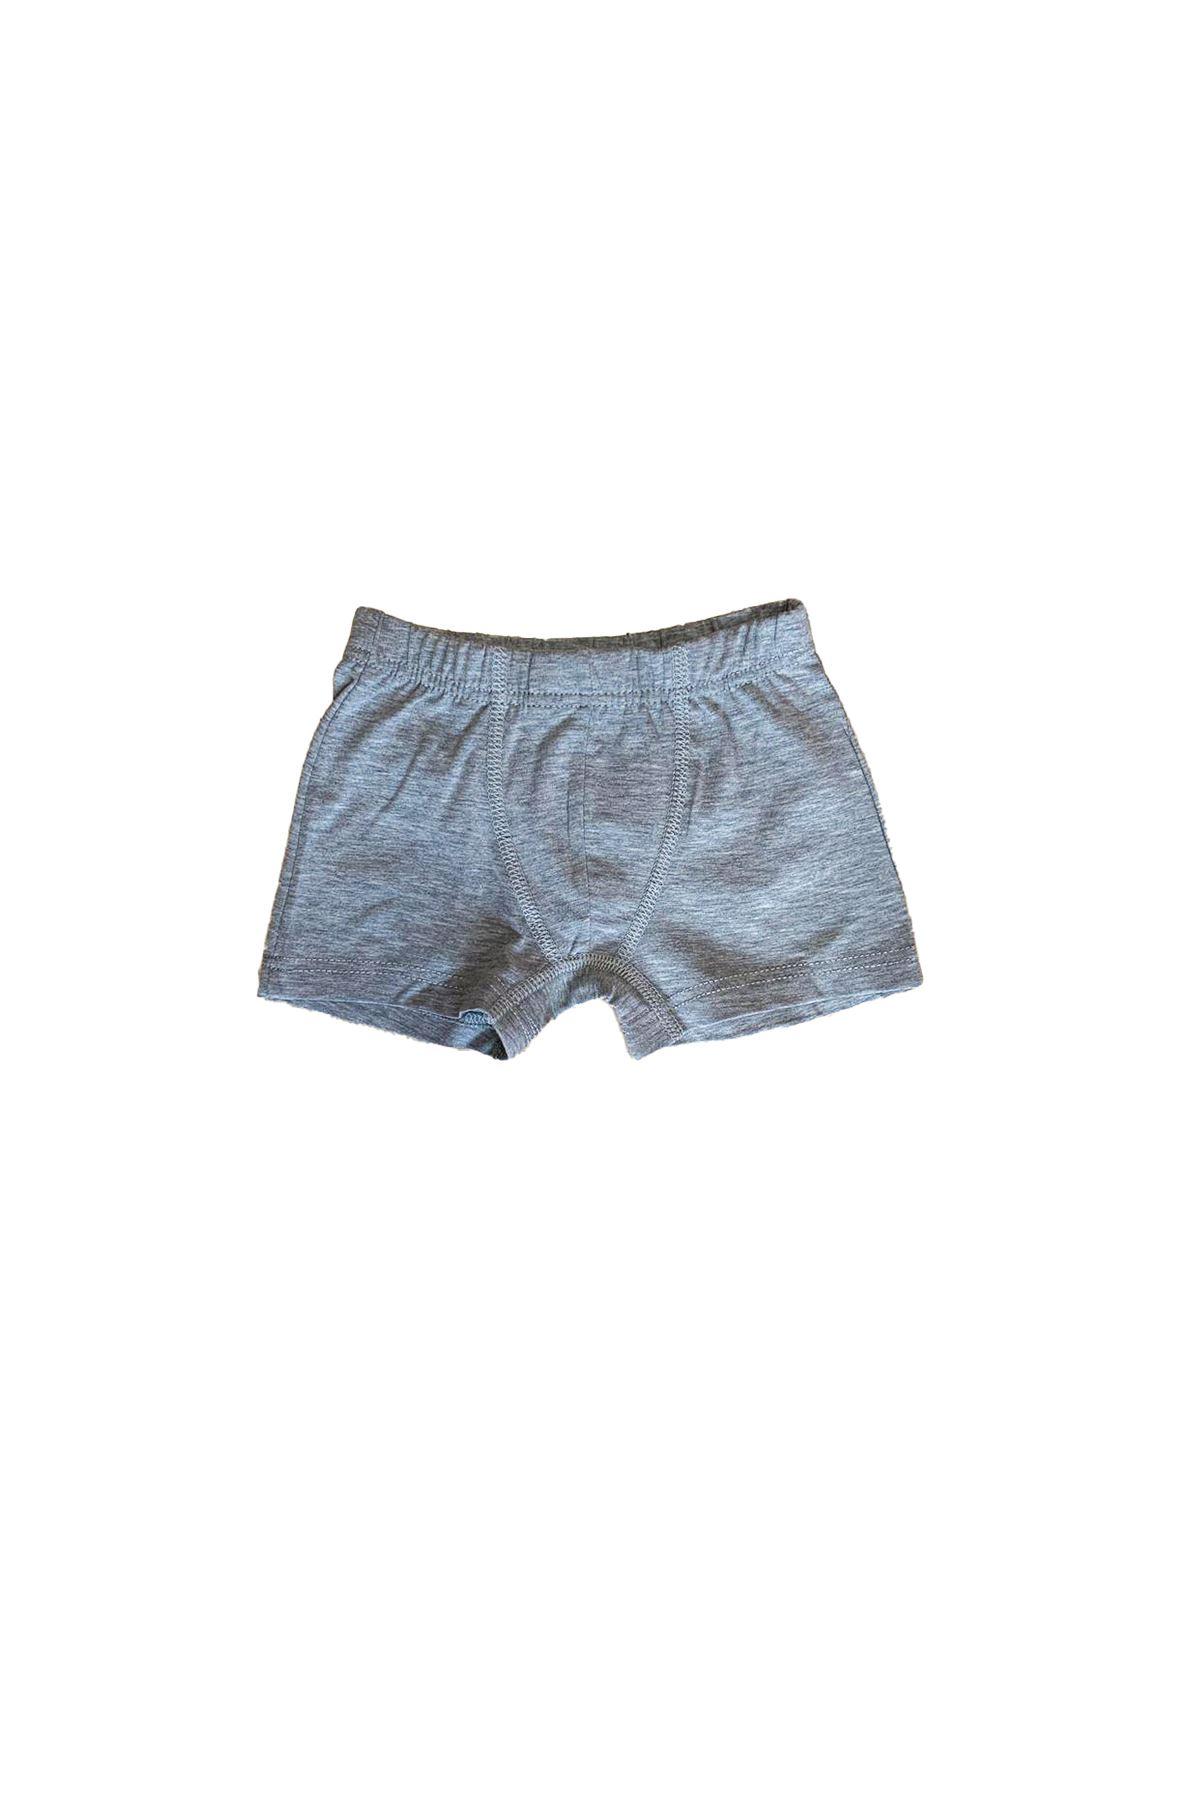 Gri Erkek Çocuk Pamuklu Boxer 209